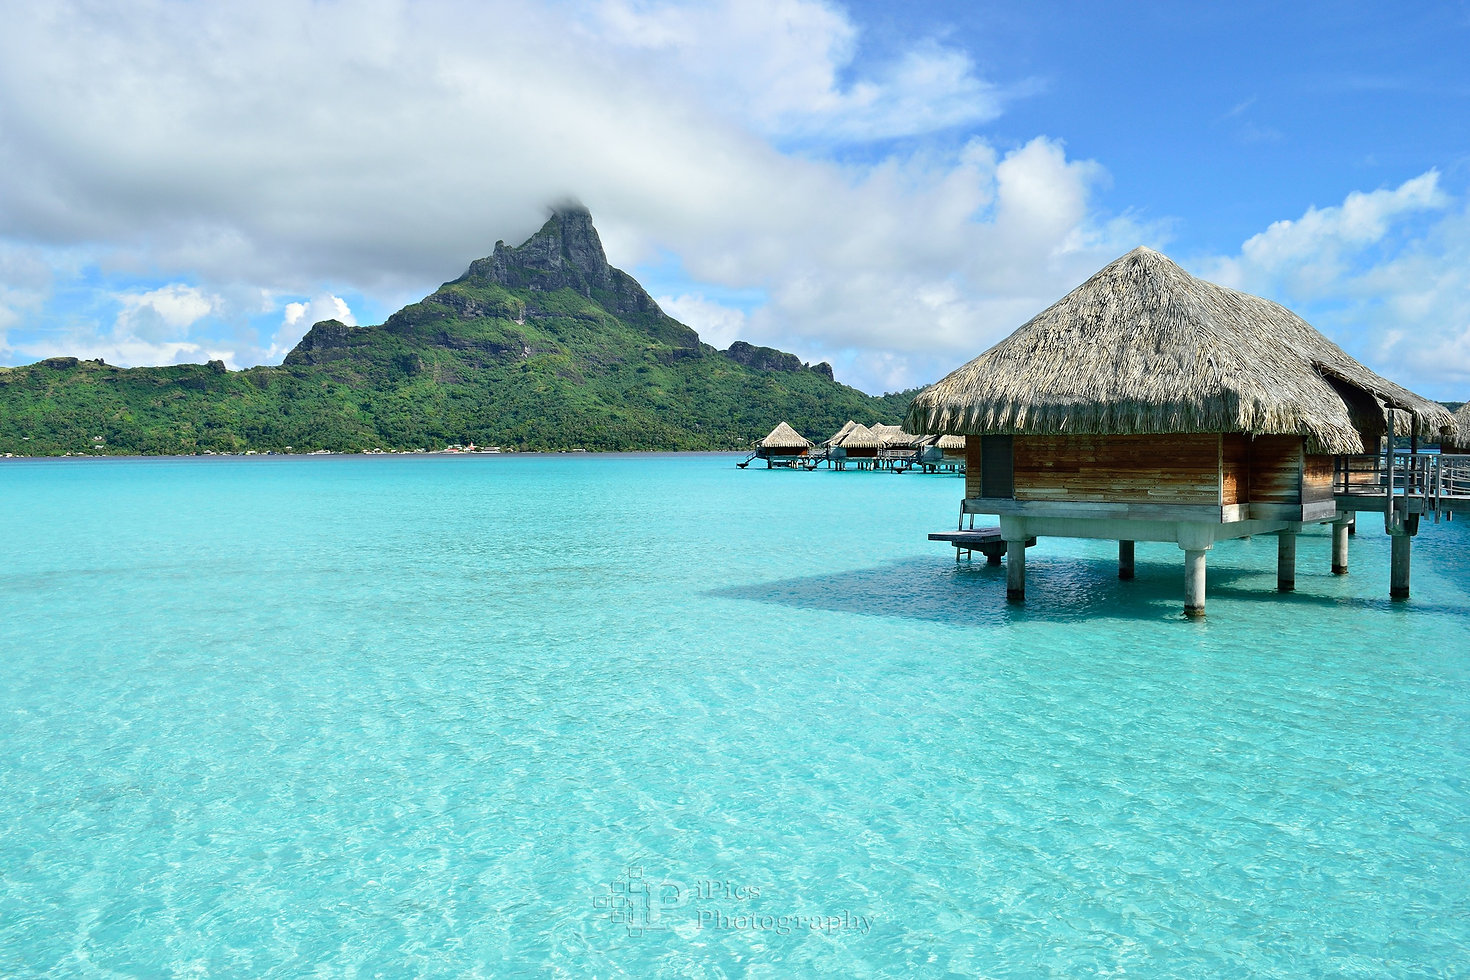 Overwater bungalow resort on Bora Bora